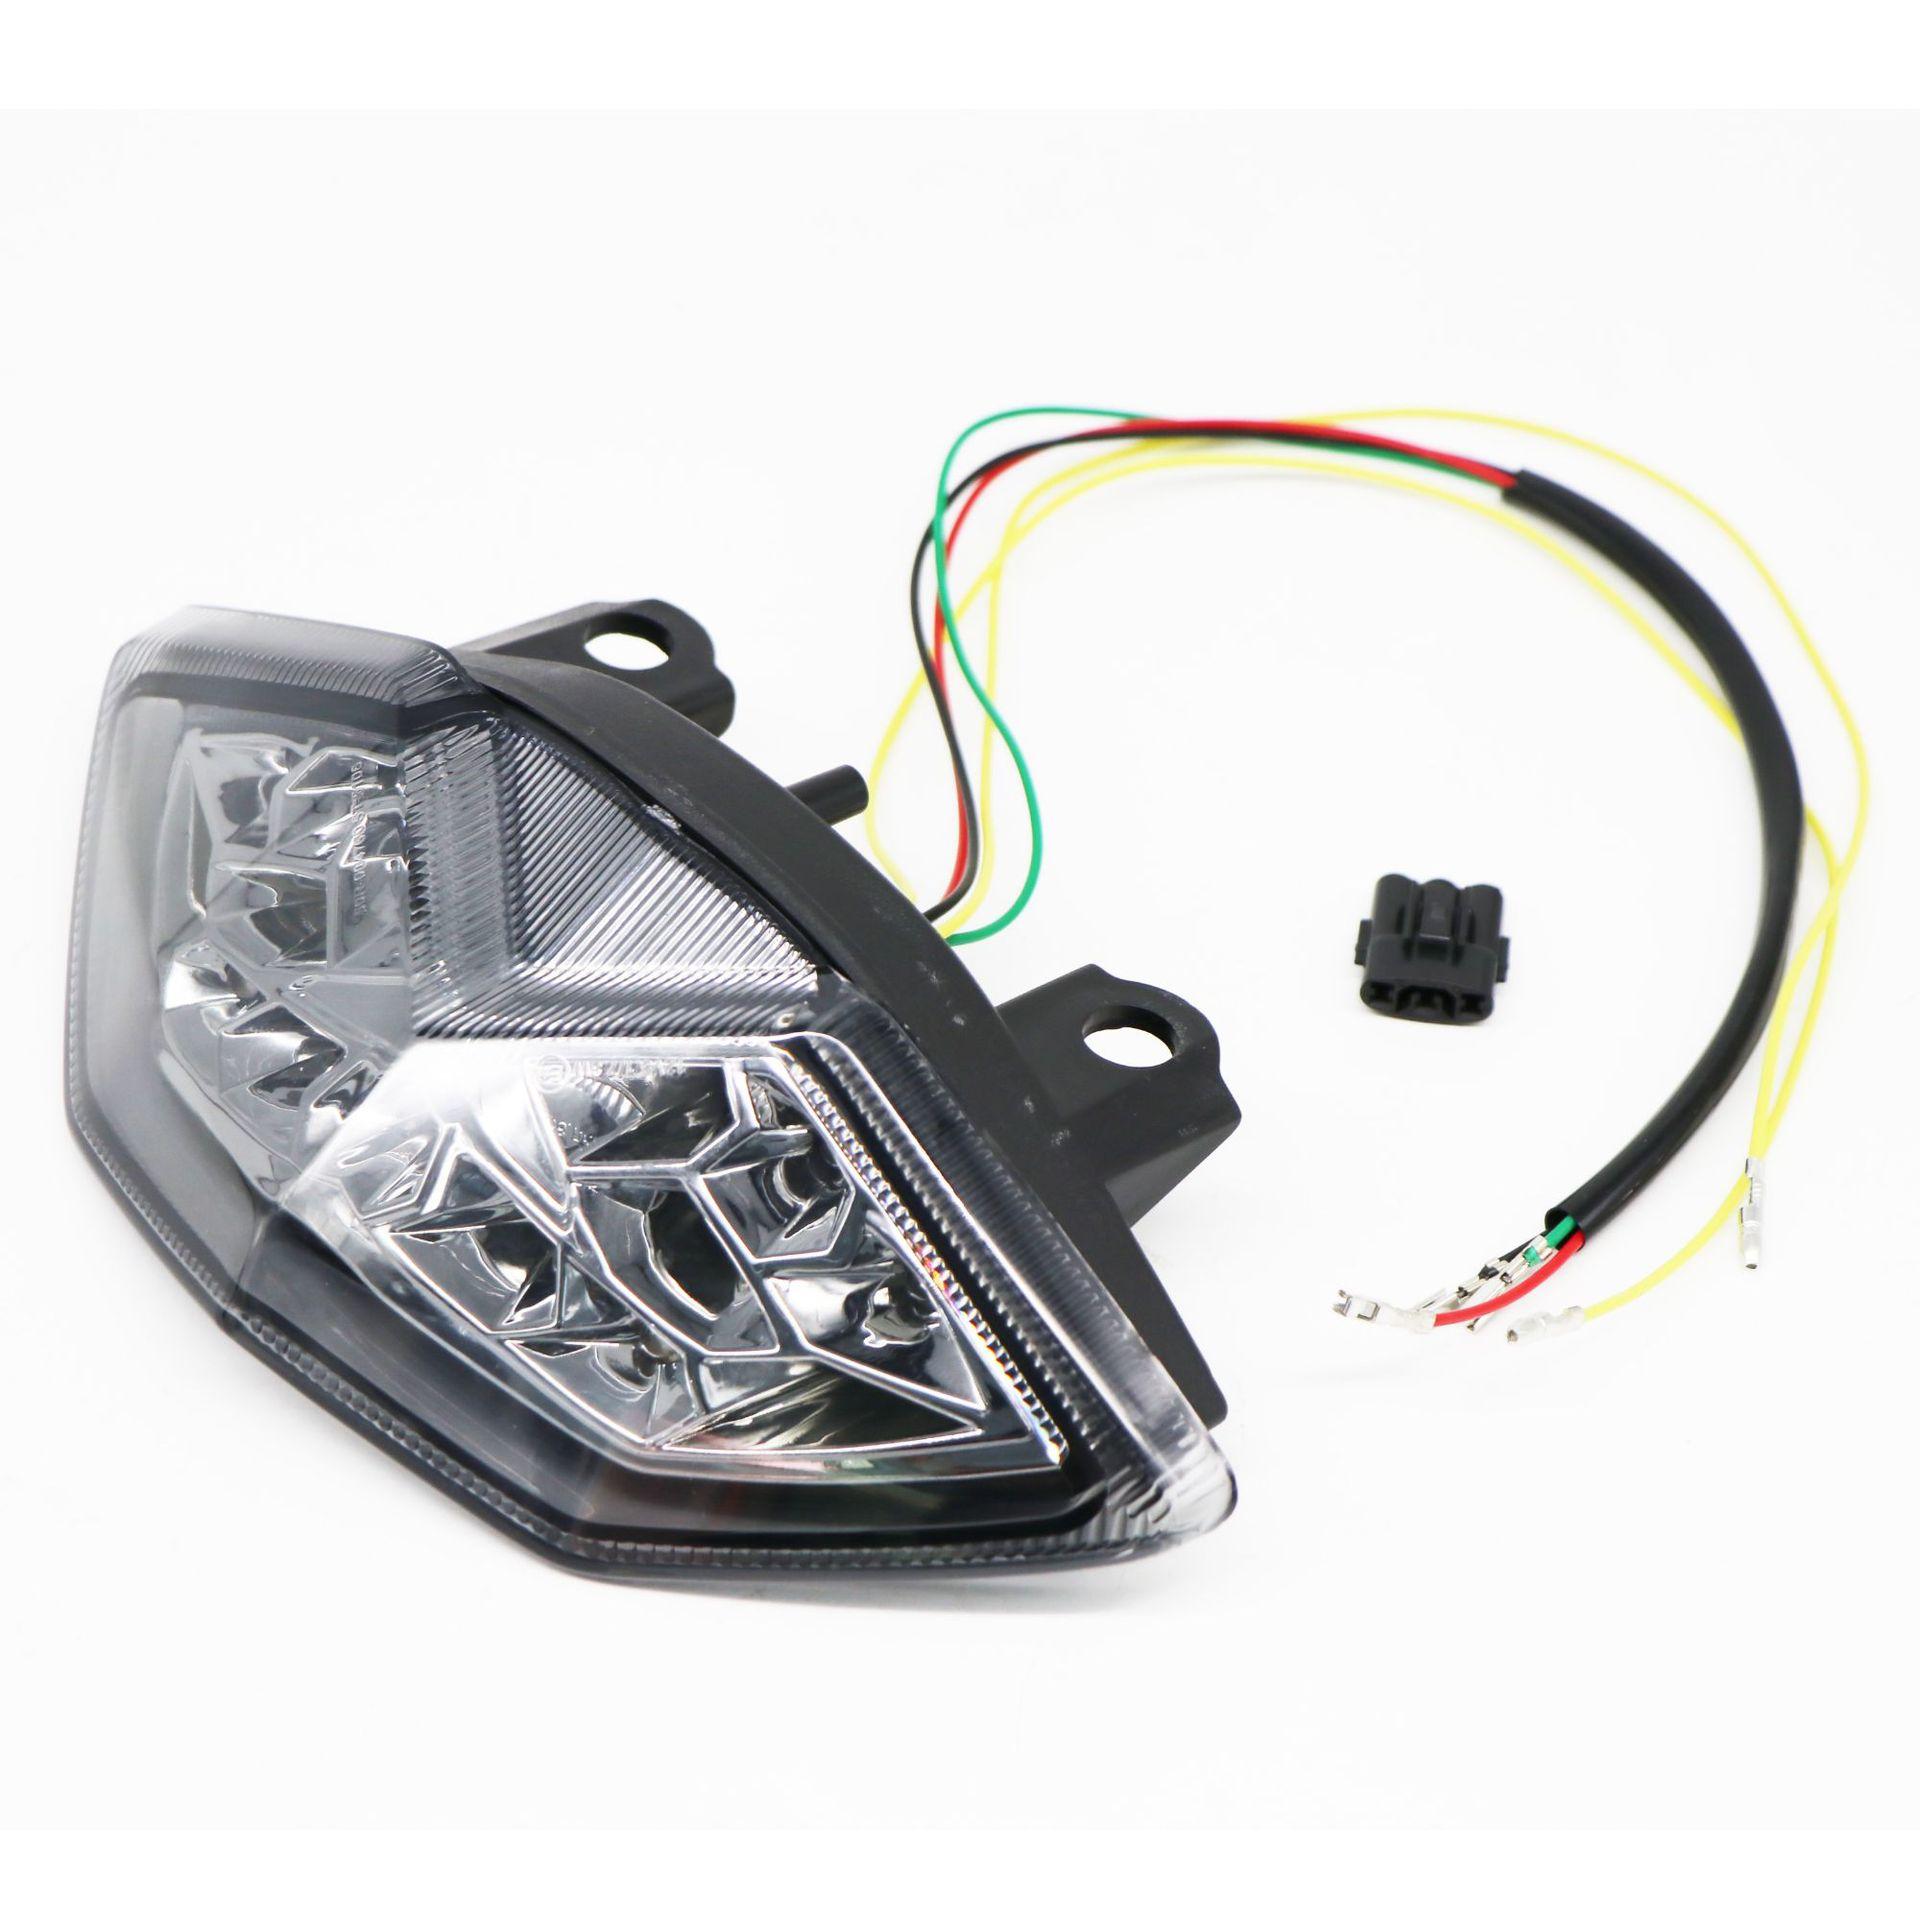 For Kawasaki Z1000 10-13 Rear Tail Light Brake Turn Signals Integrated Chrome LED Light Transparent shell